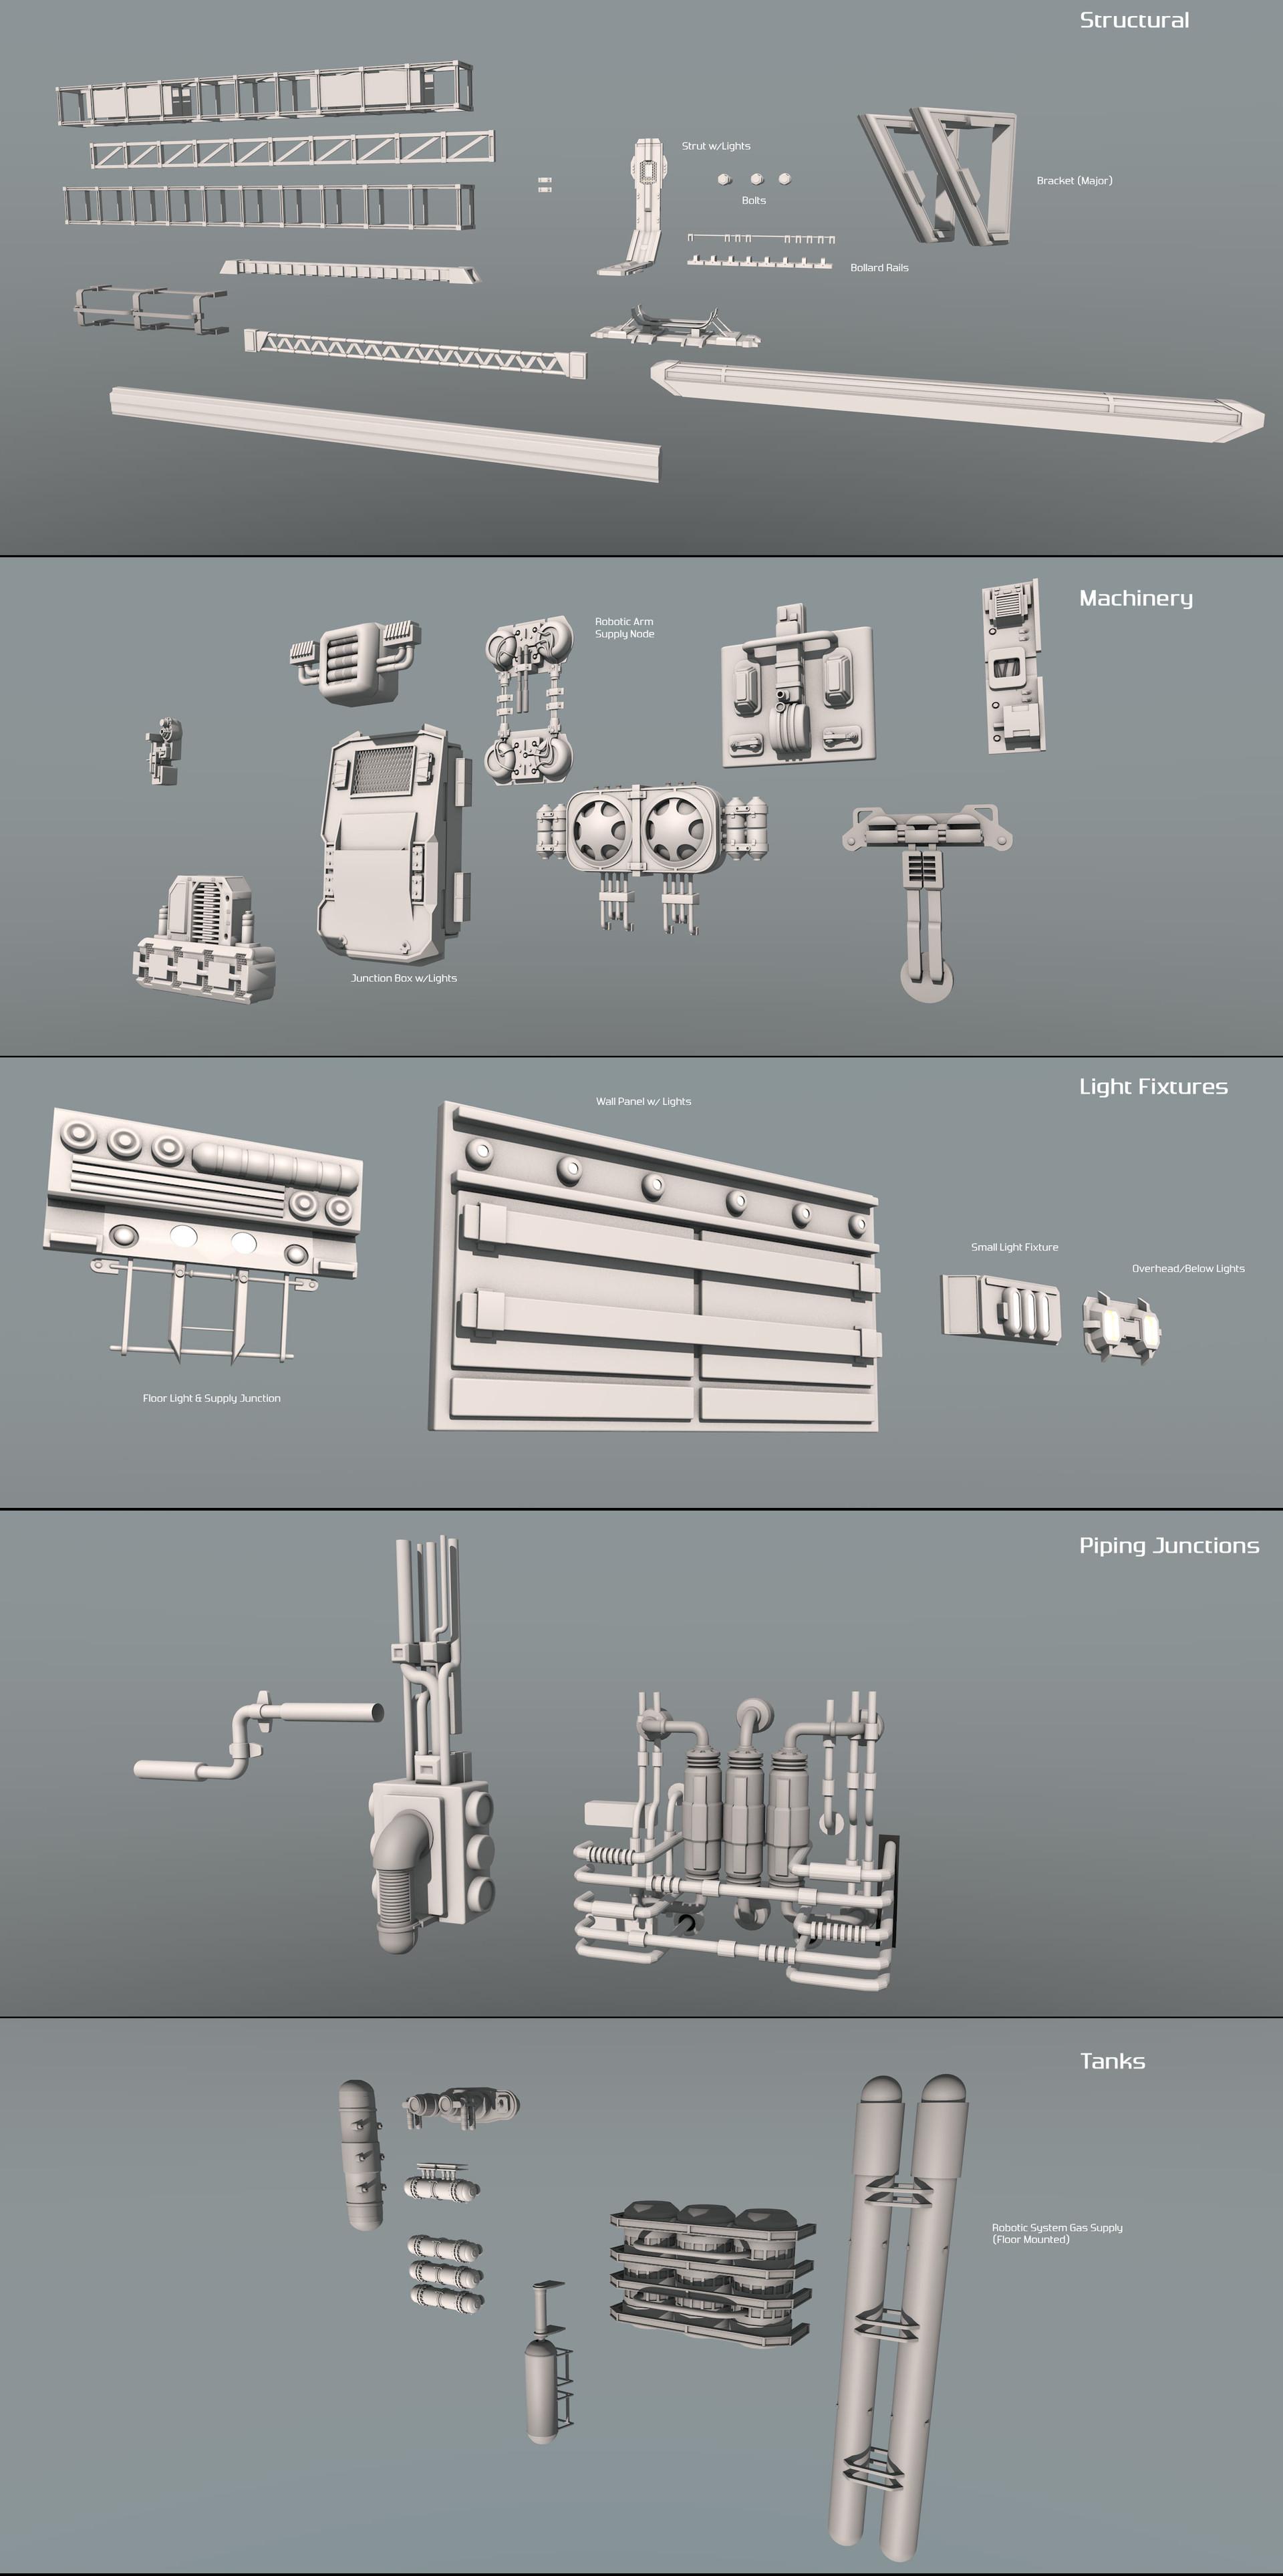 Glenn clovis hangar basic components